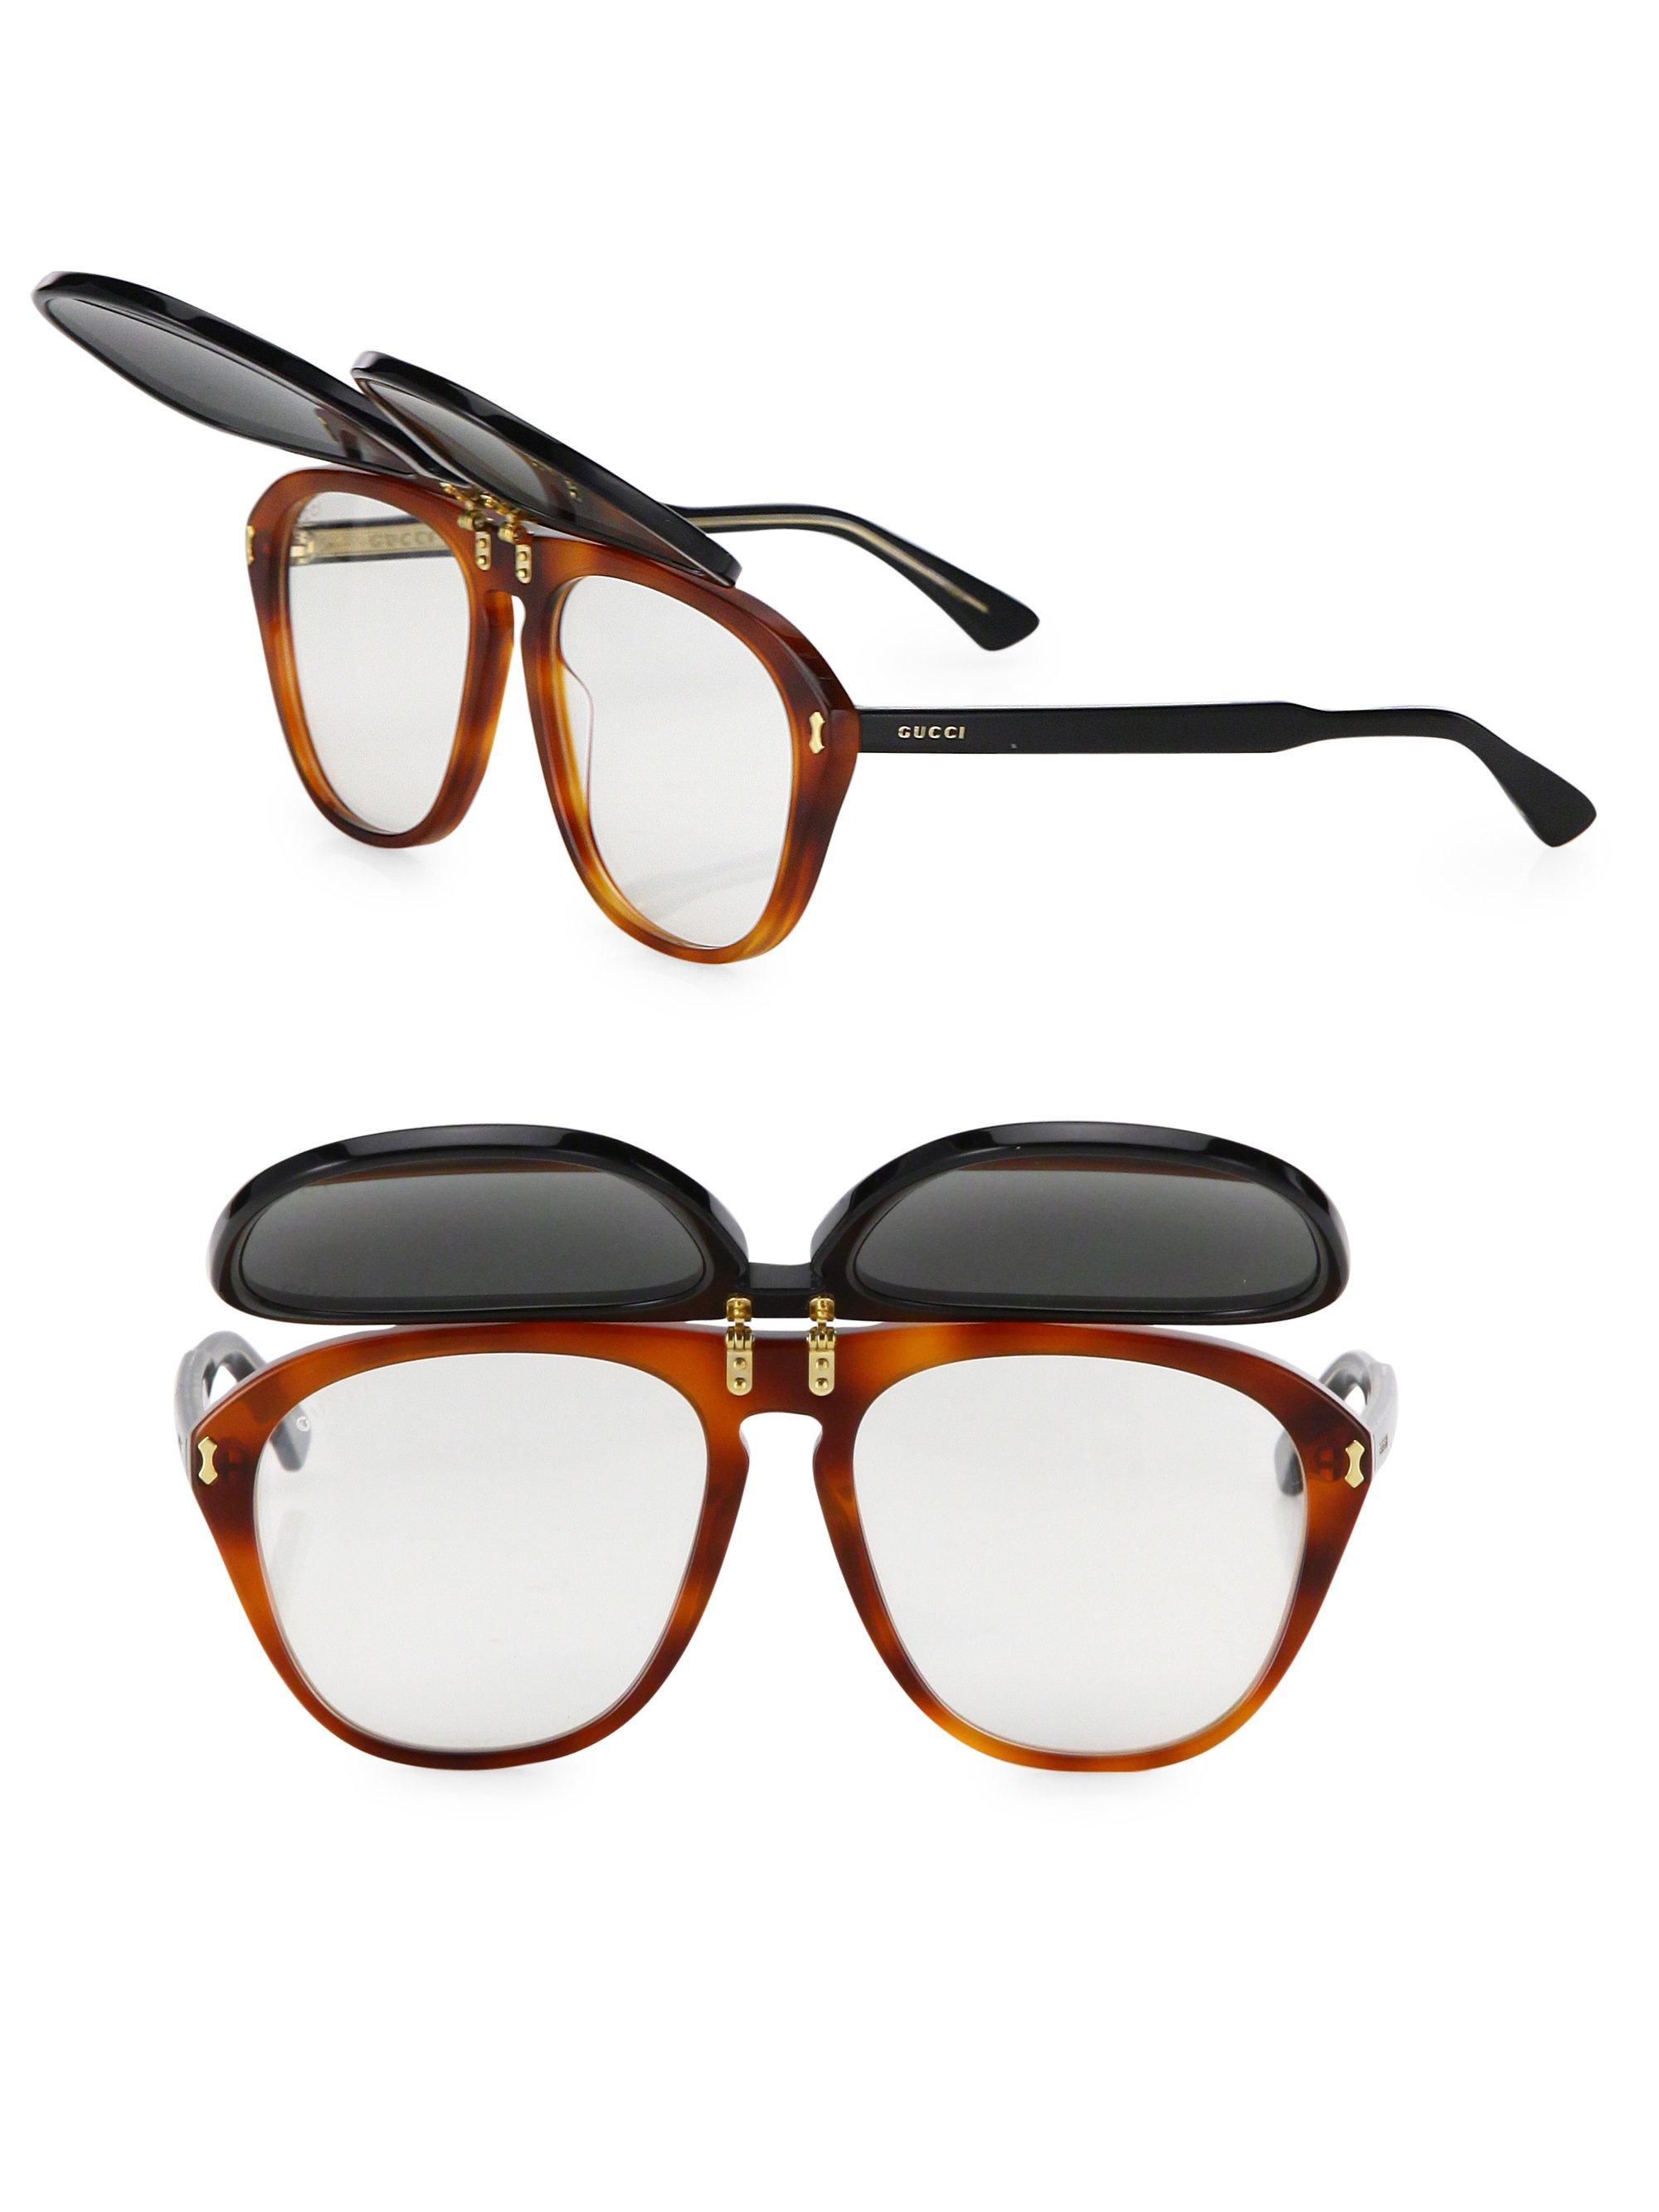 dbc82f34bb DG4268 DG4268 Source · Lyst Gucci 56mm Flip up Pilot Sunglasses in Black  for Men